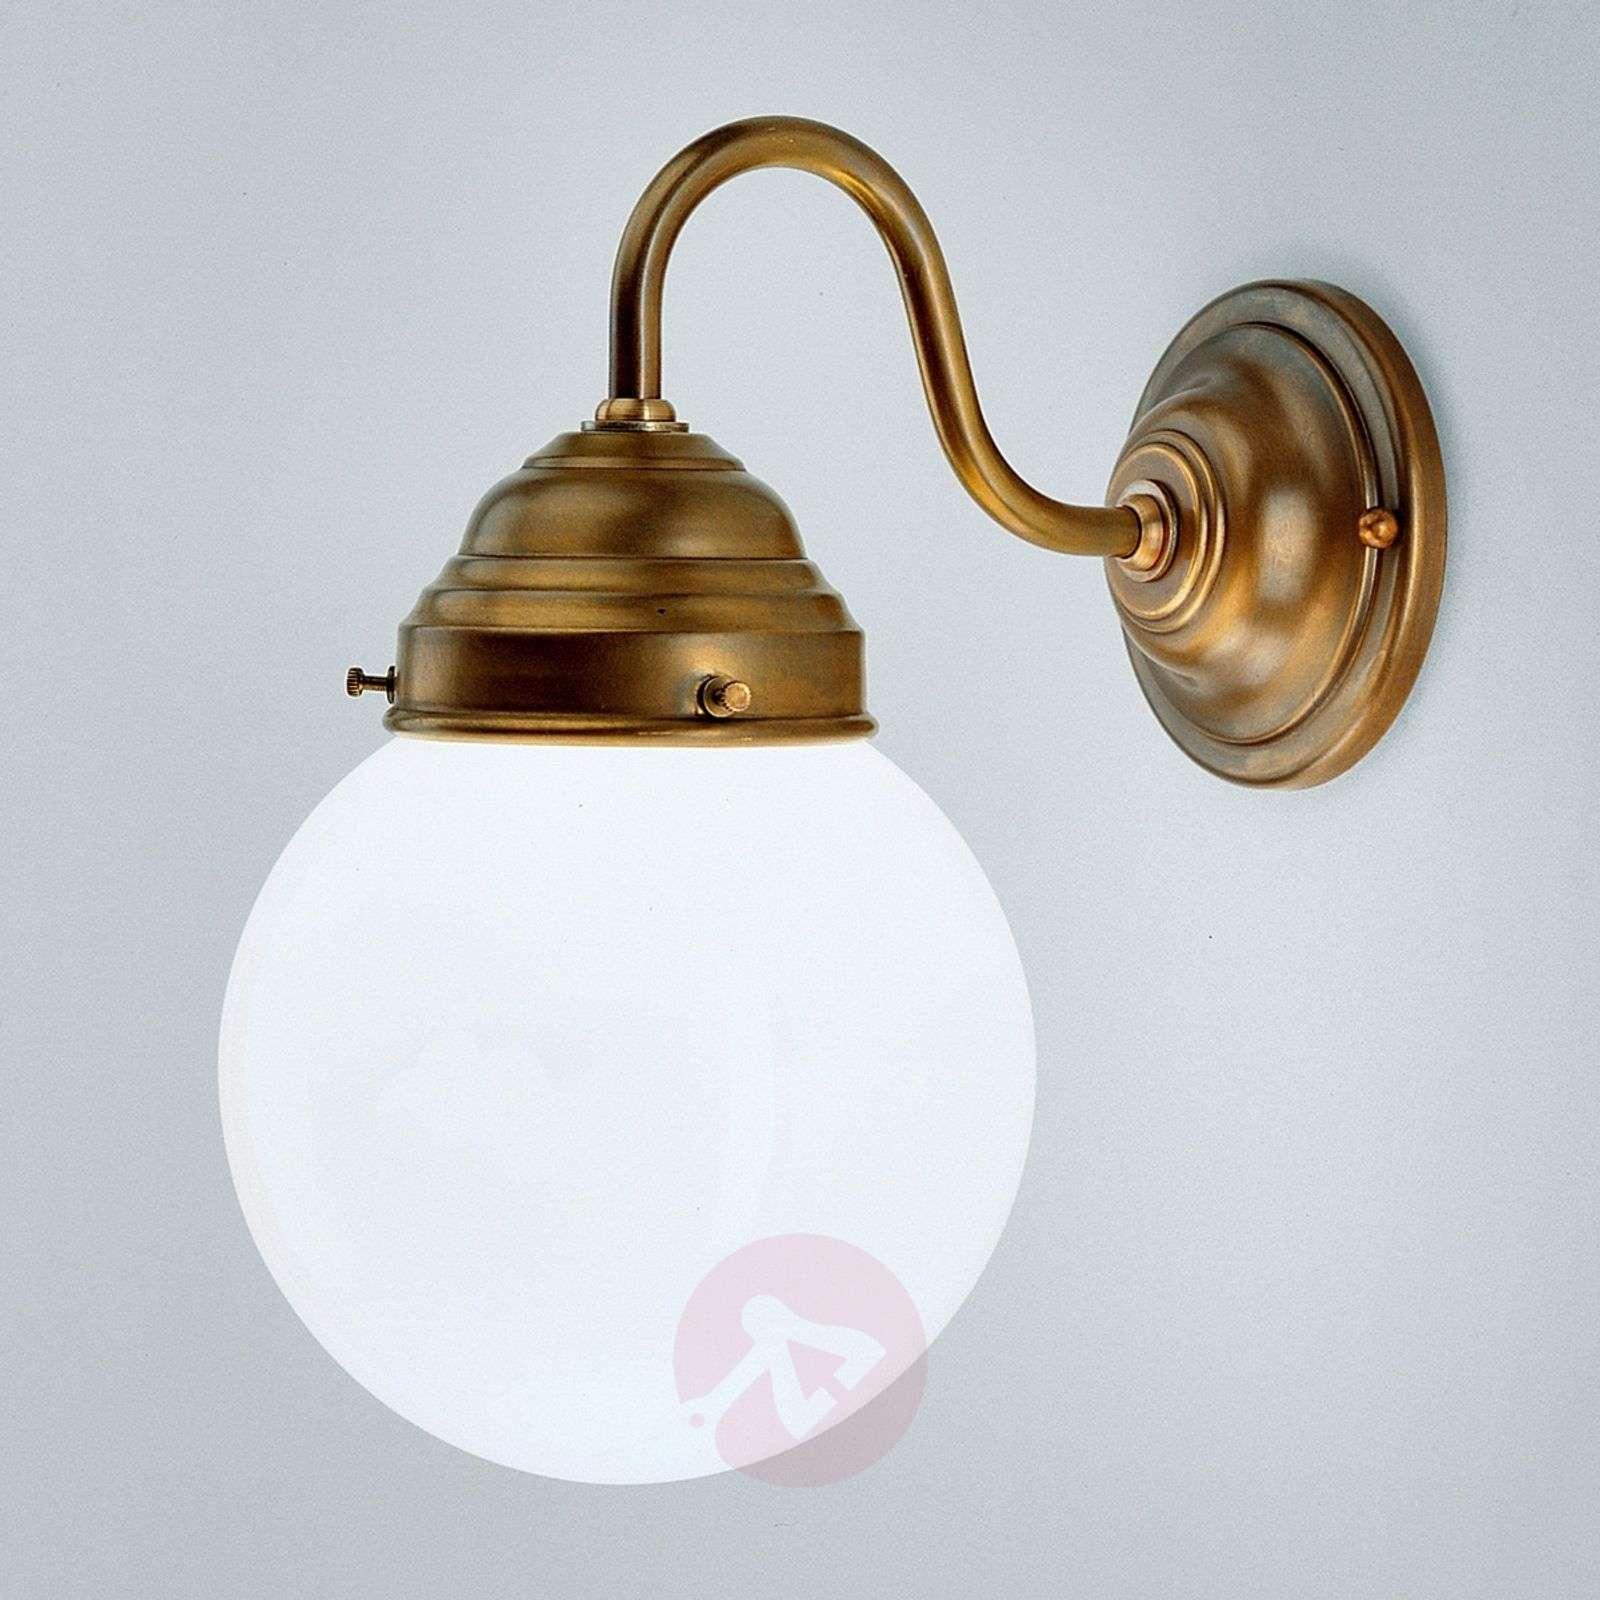 Larry wall light made of brass-1542097-01